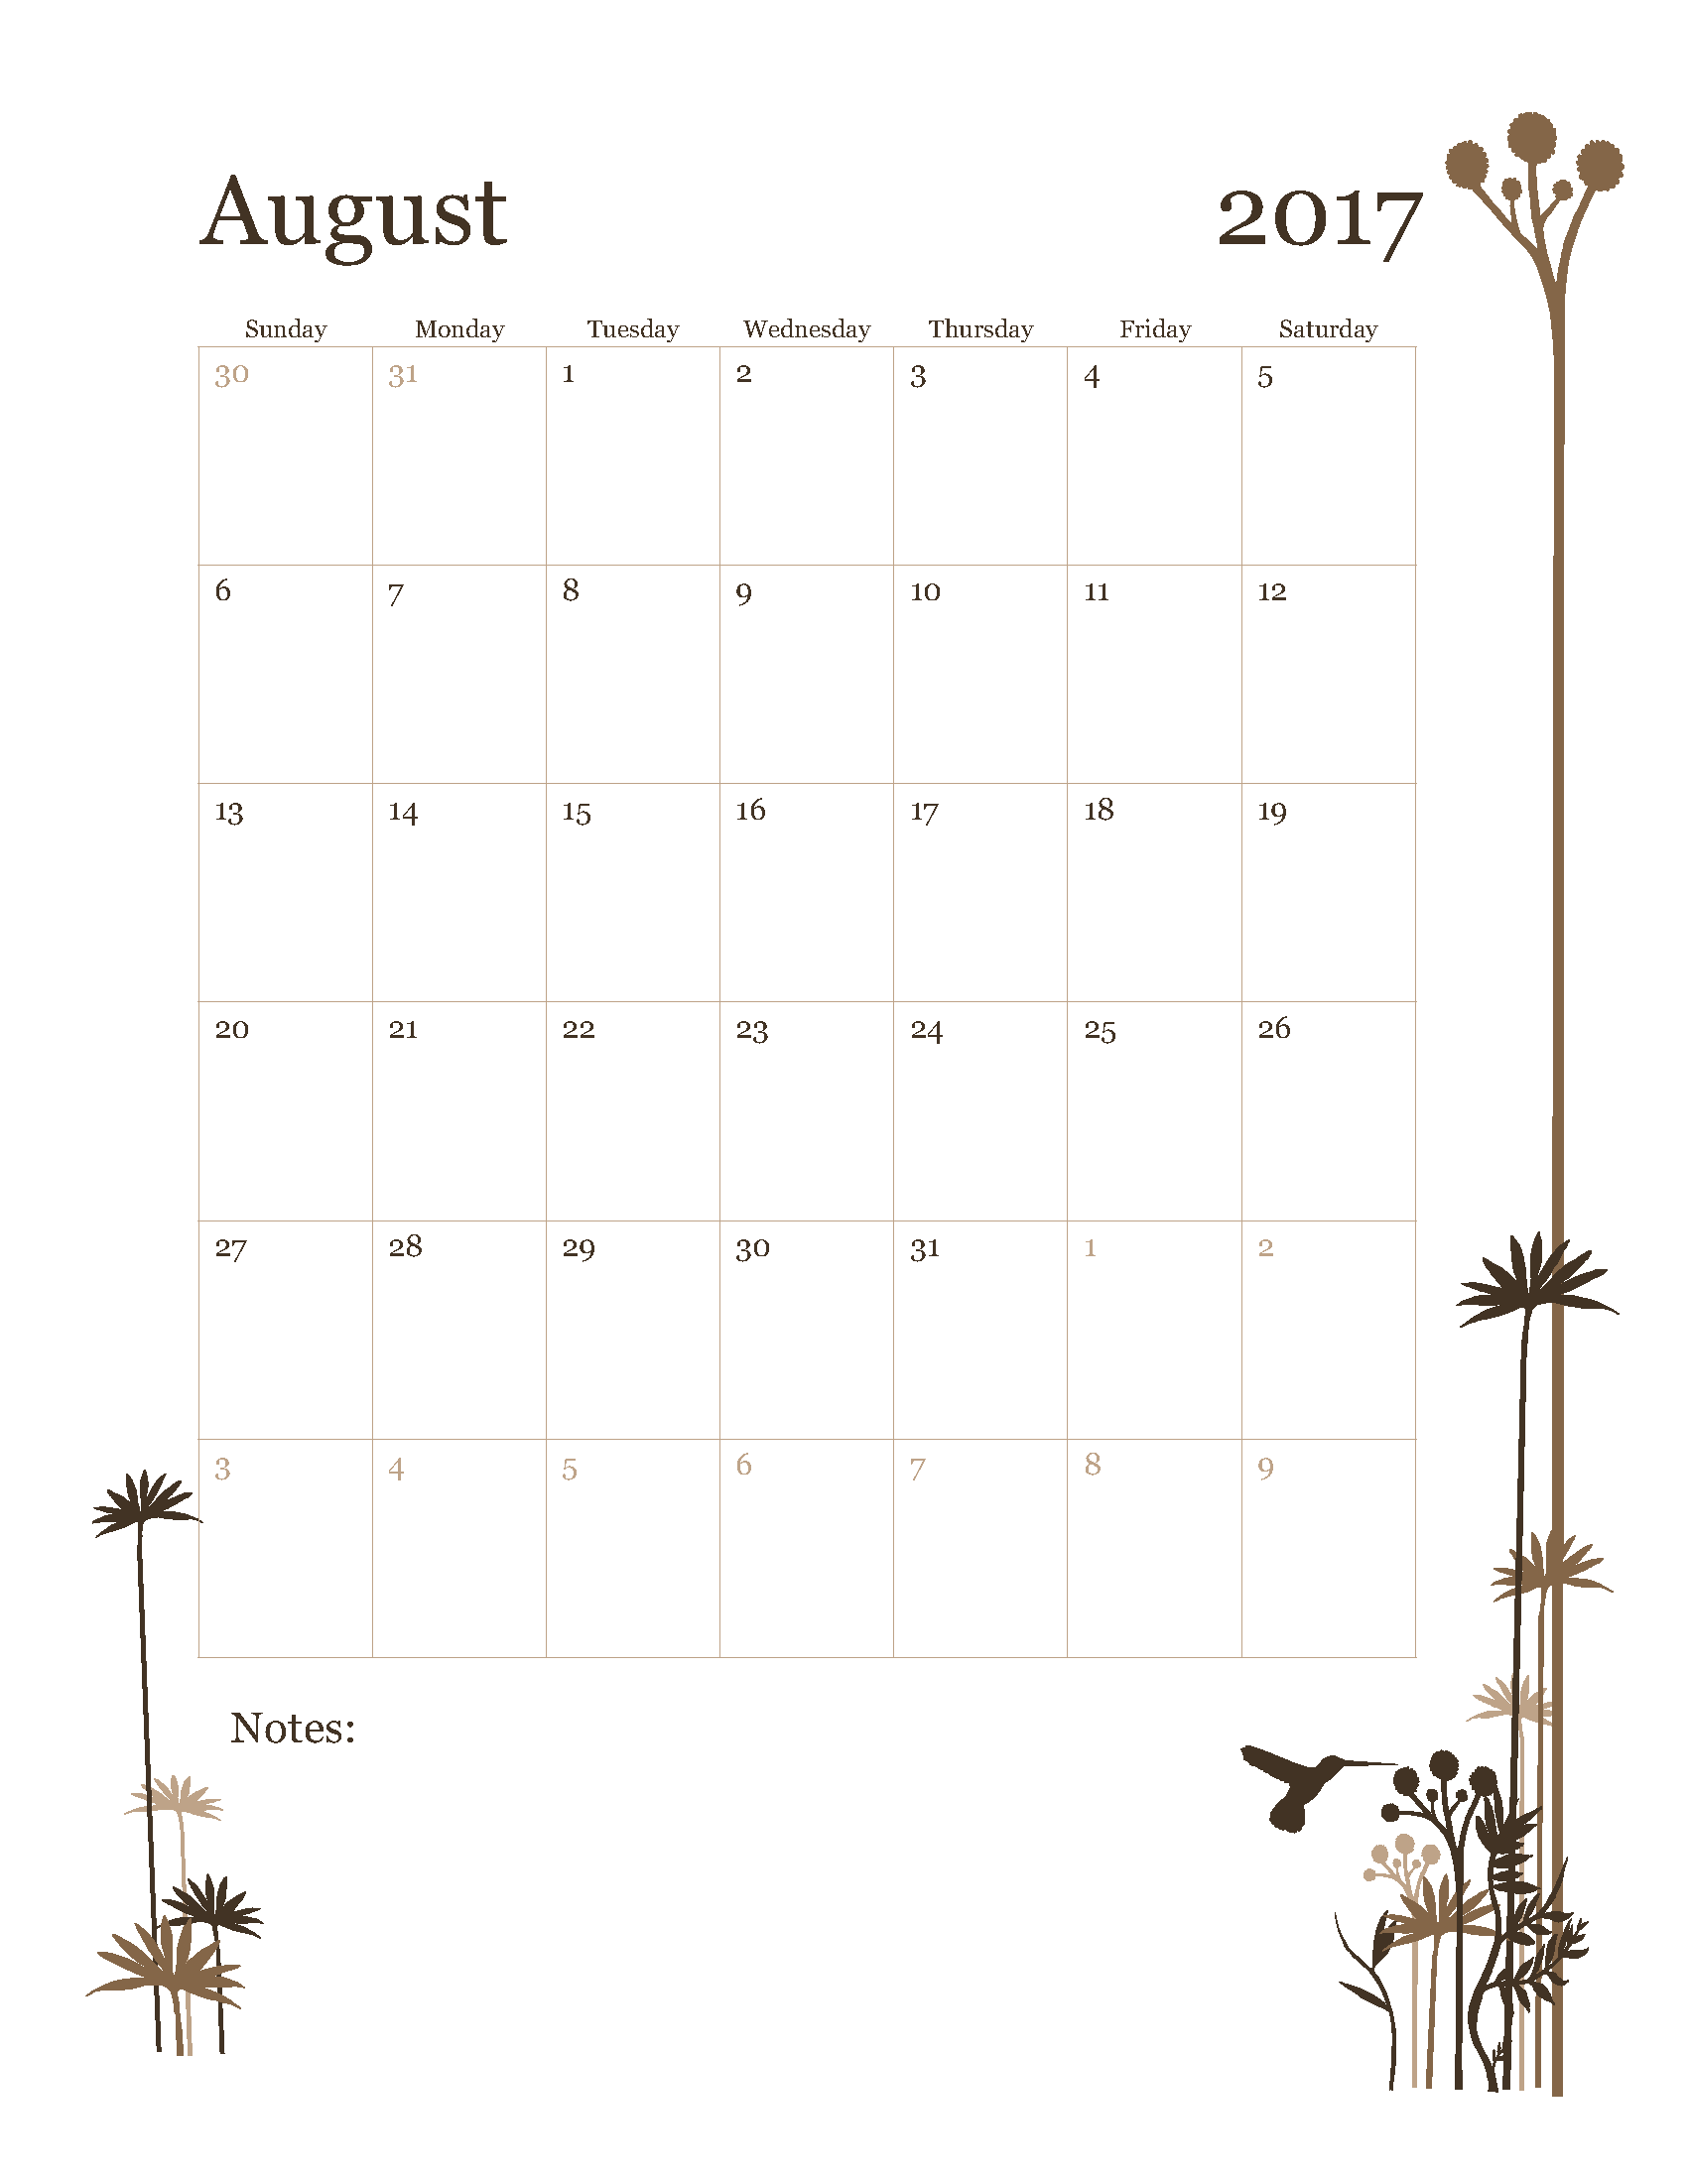 Free August 2017 Calendar Template Printable Start on Sunday - HummingBird design